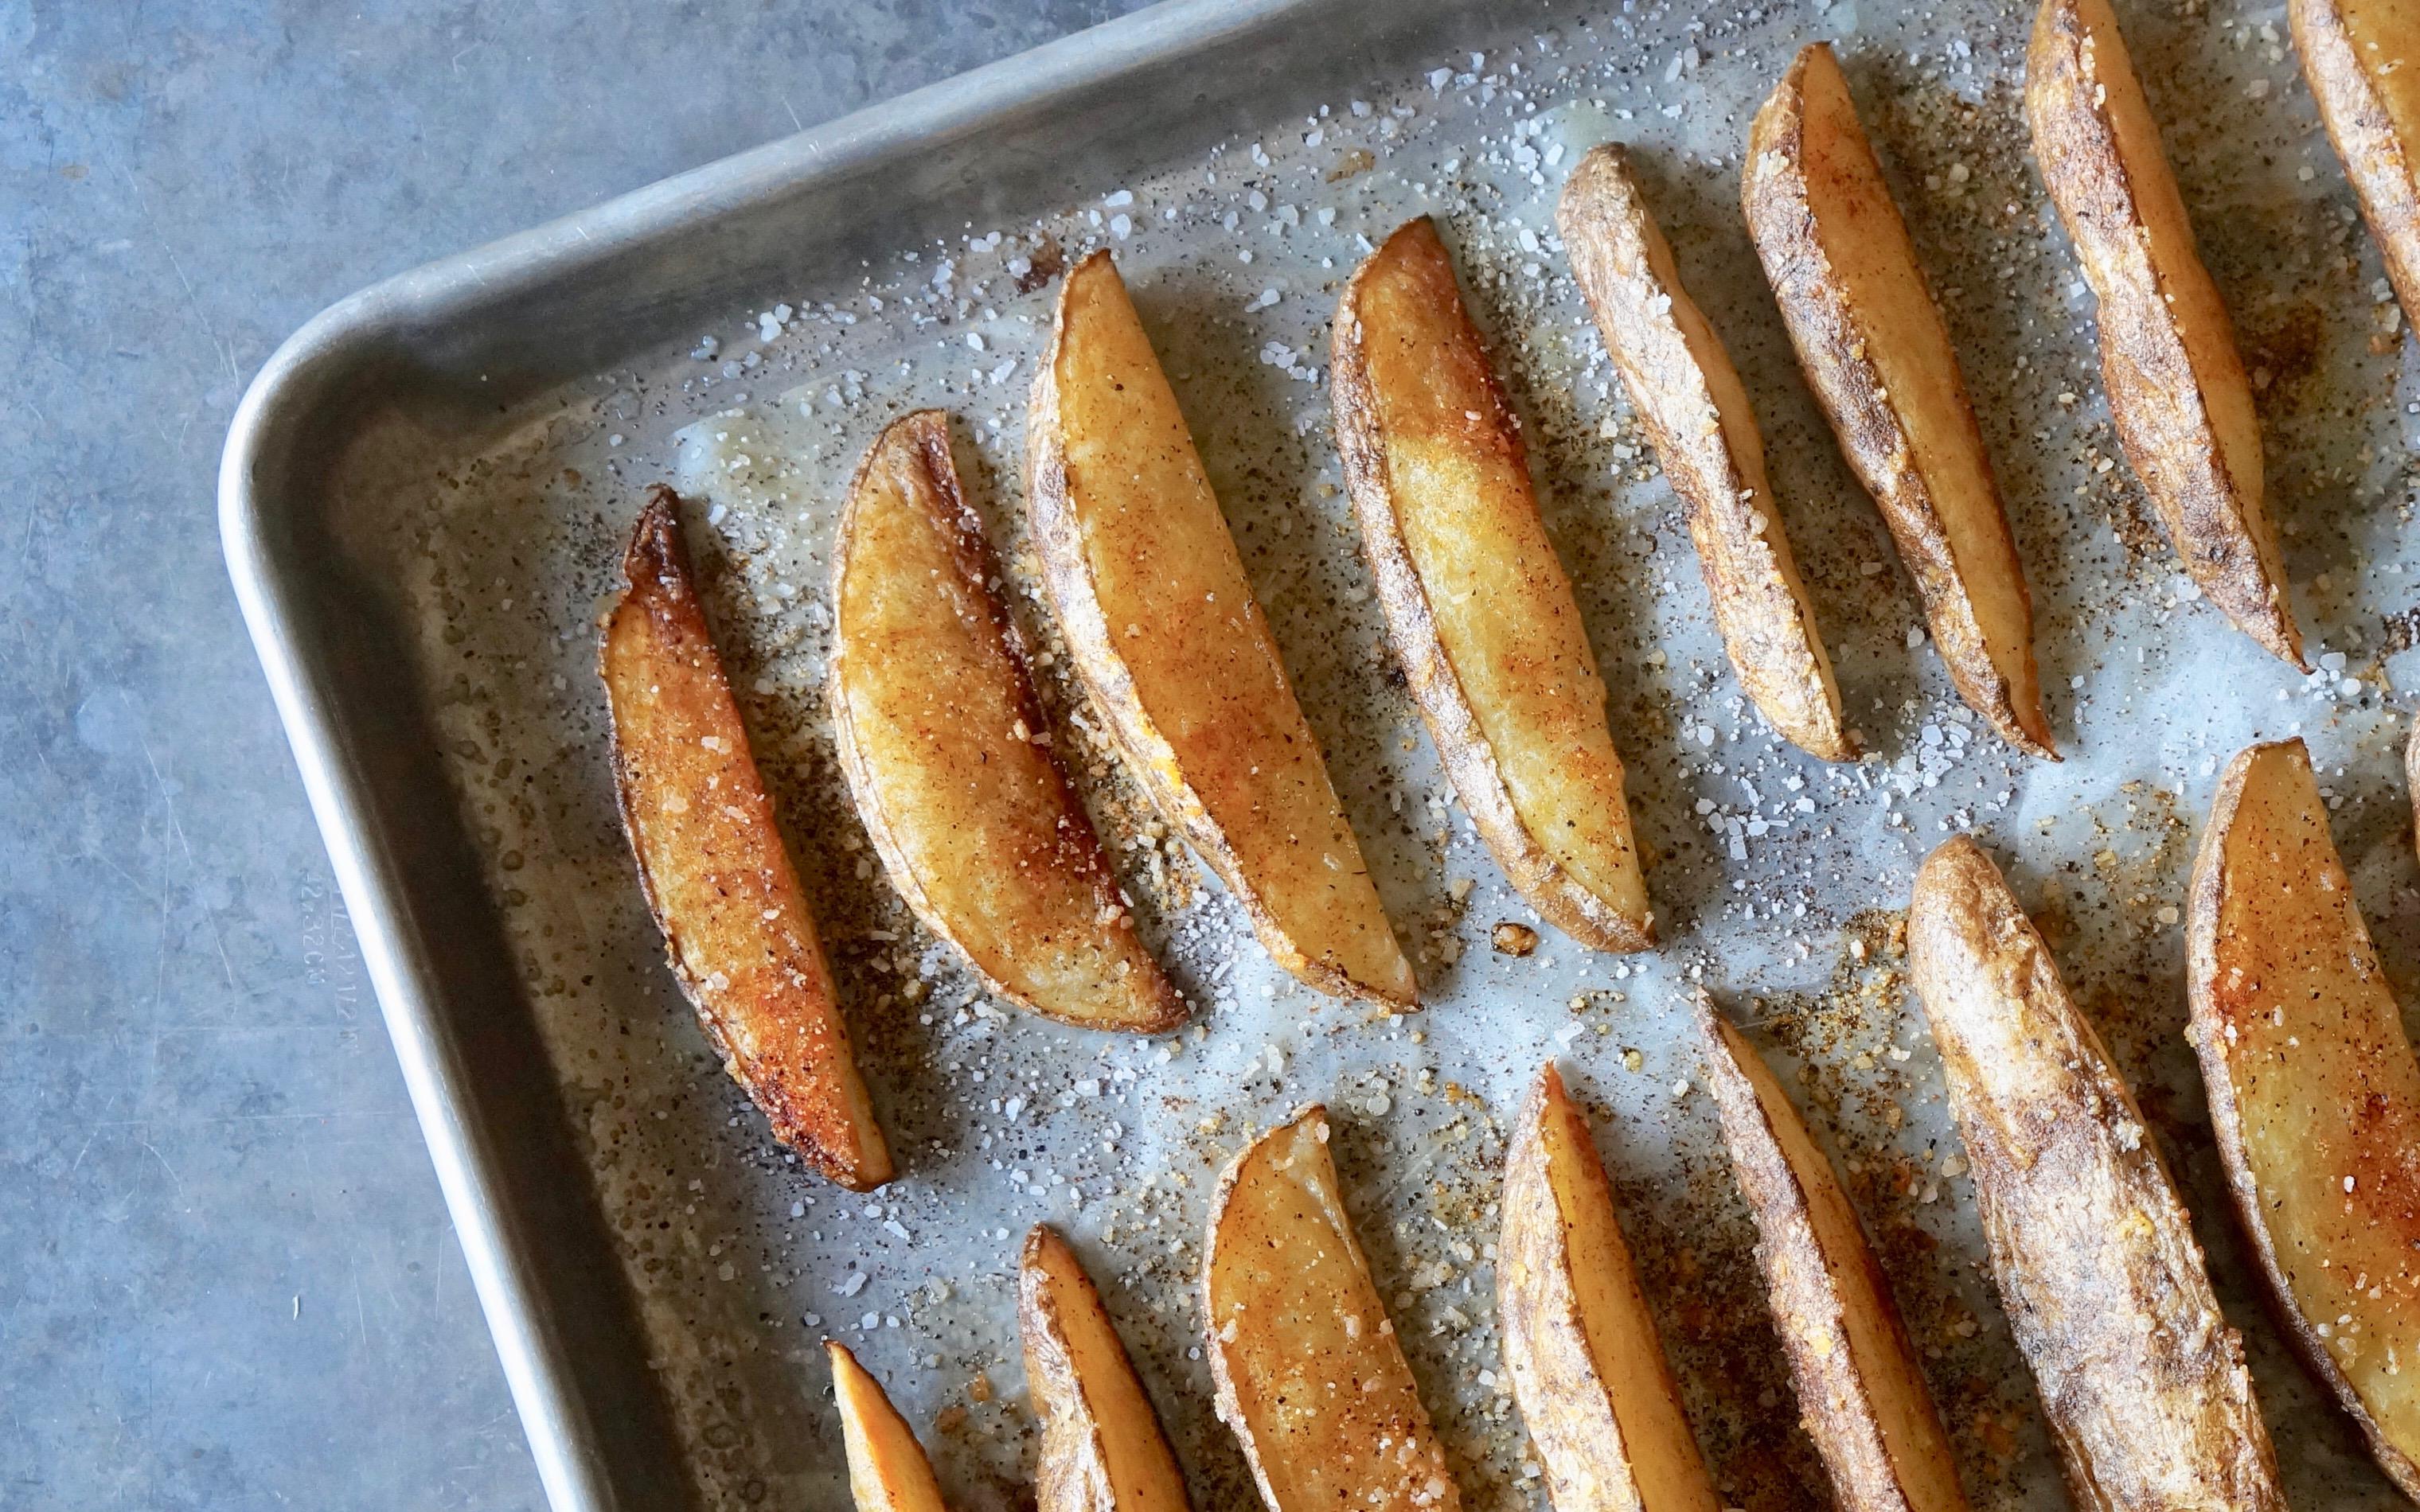 How-To-Make-Crispy-Baked-Potato-Wedges-Rebecca-Gordon-Publisher-Buttermilk-Lipstick-Culinary-Entertaining-Techniques-RebeccaGordon-Pastry-Chef-Birmingham-Alabama